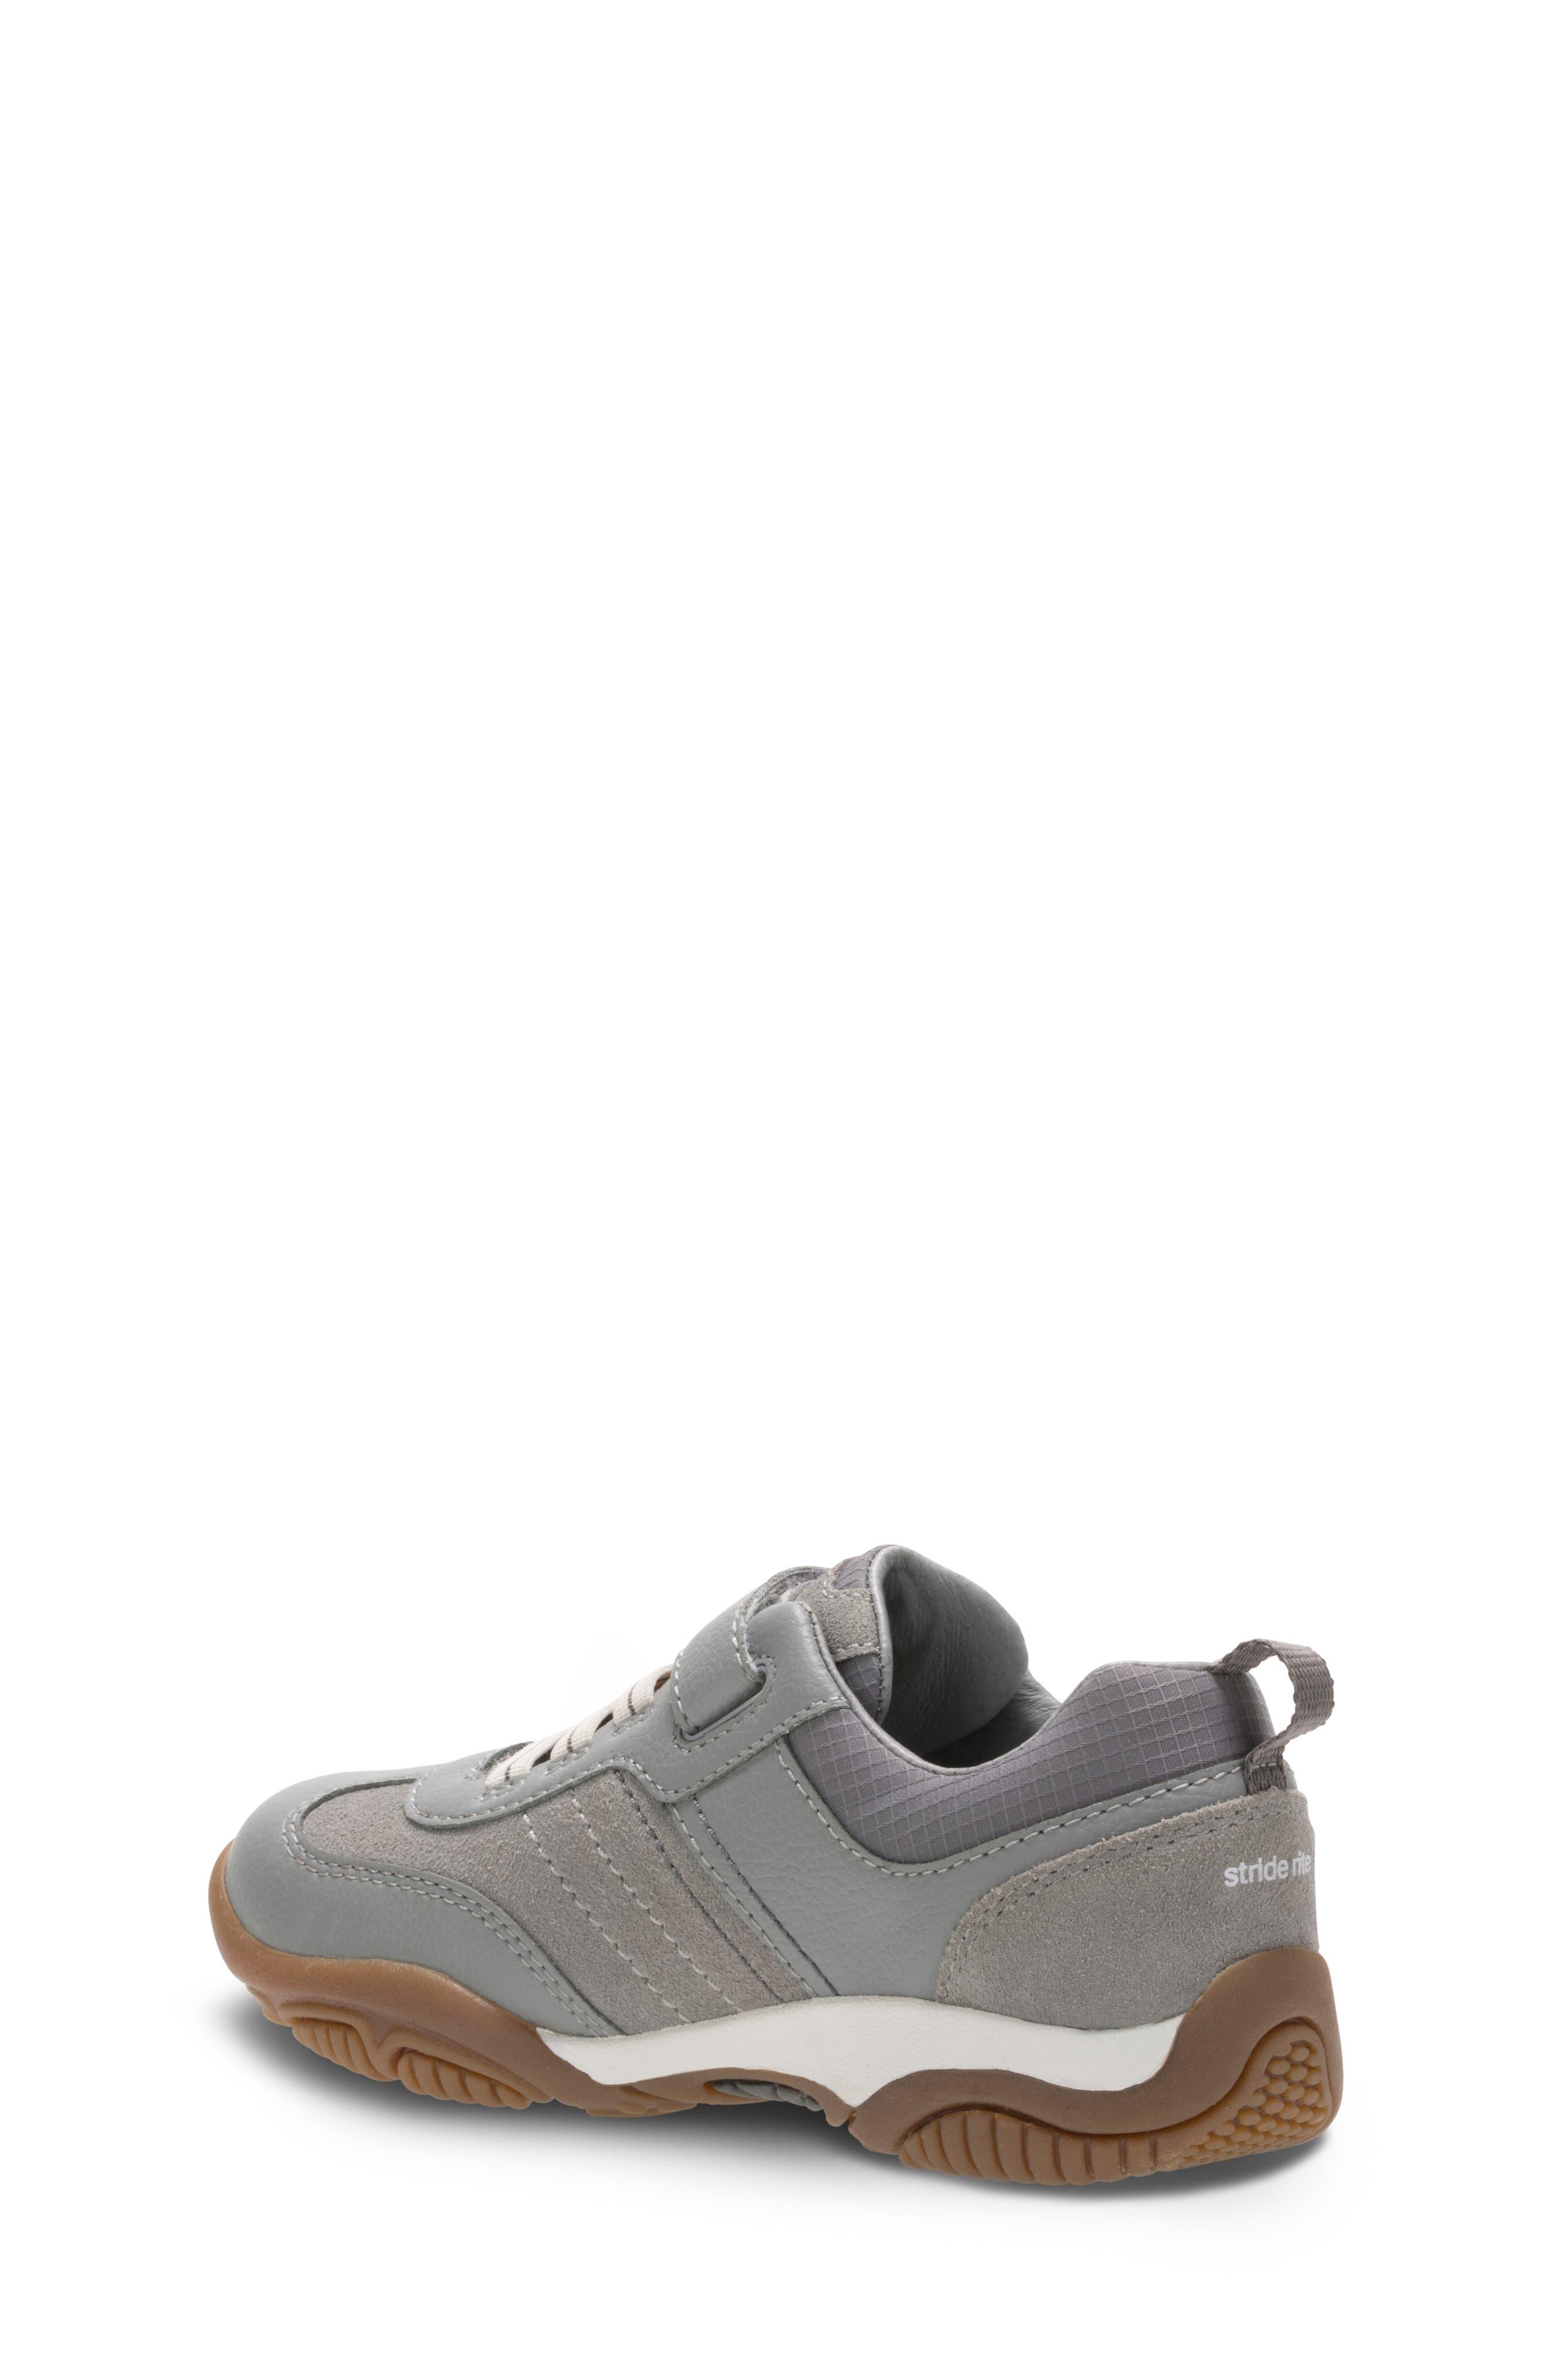 Prescott Sneaker,                             Alternate thumbnail 2, color,                             GREY